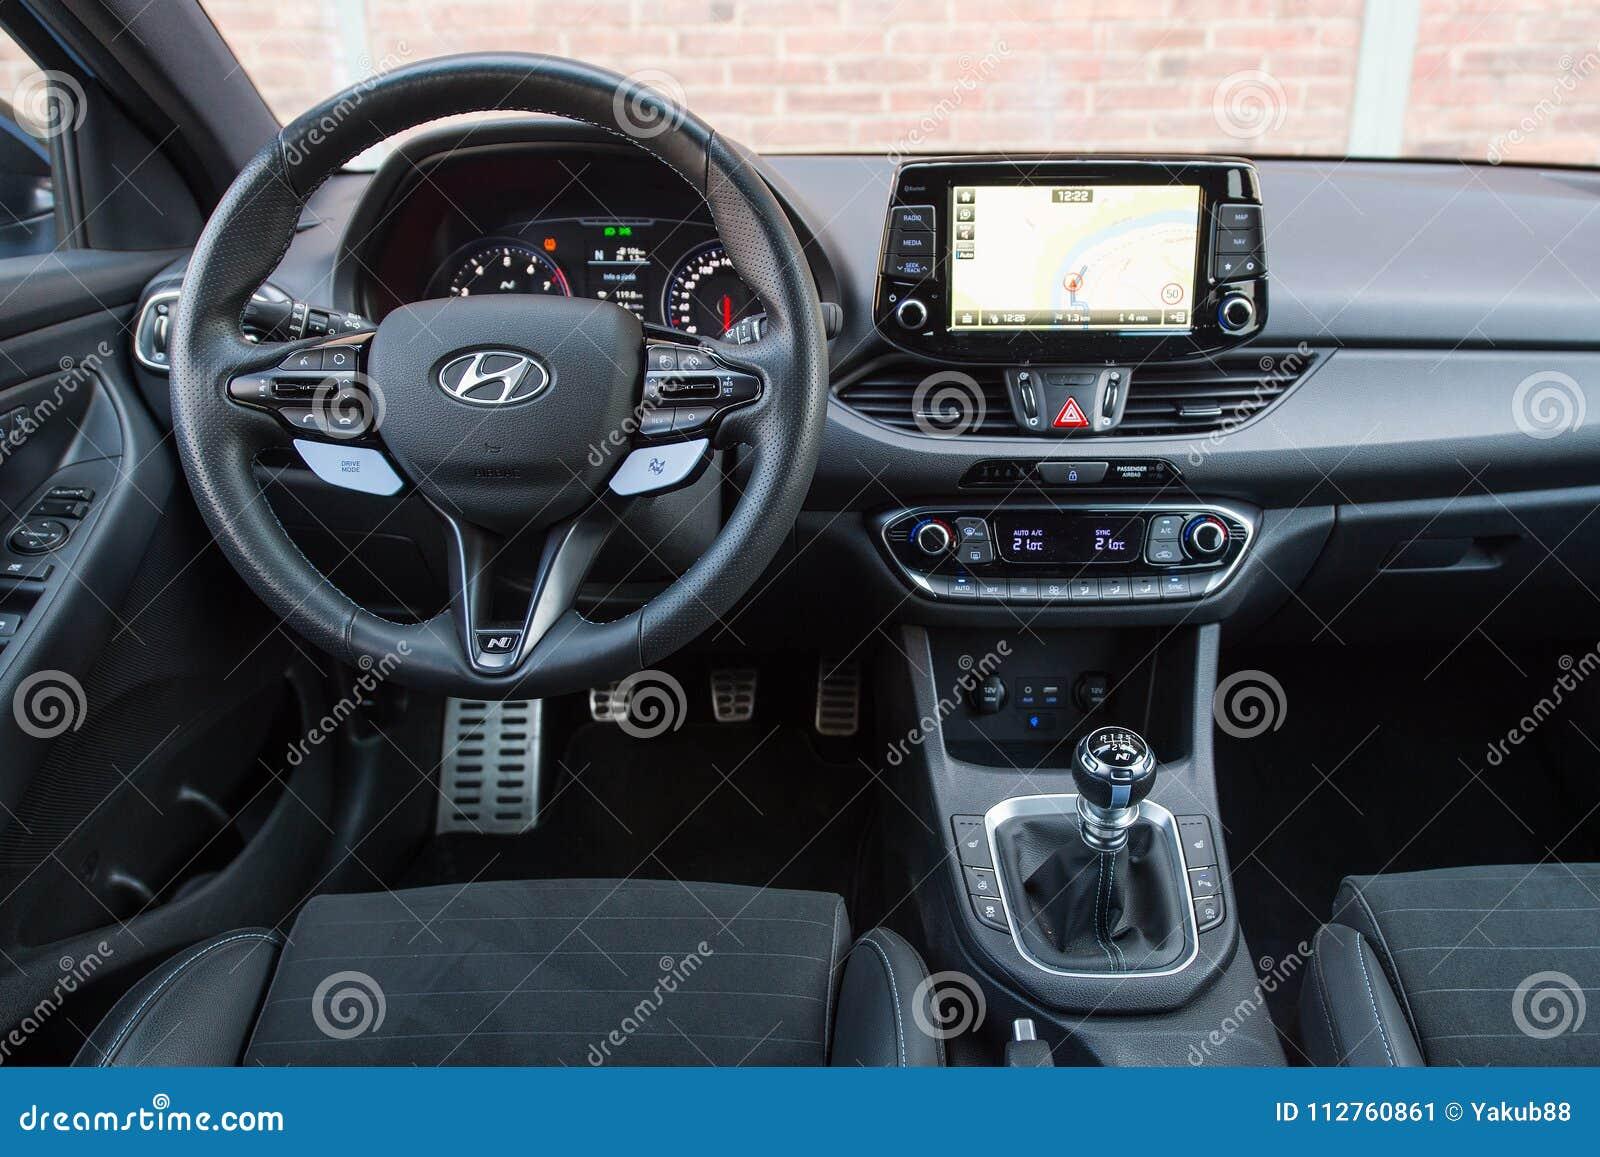 Hyundai i30 N editorial photo  Image of sportscar, hyundai - 112760861